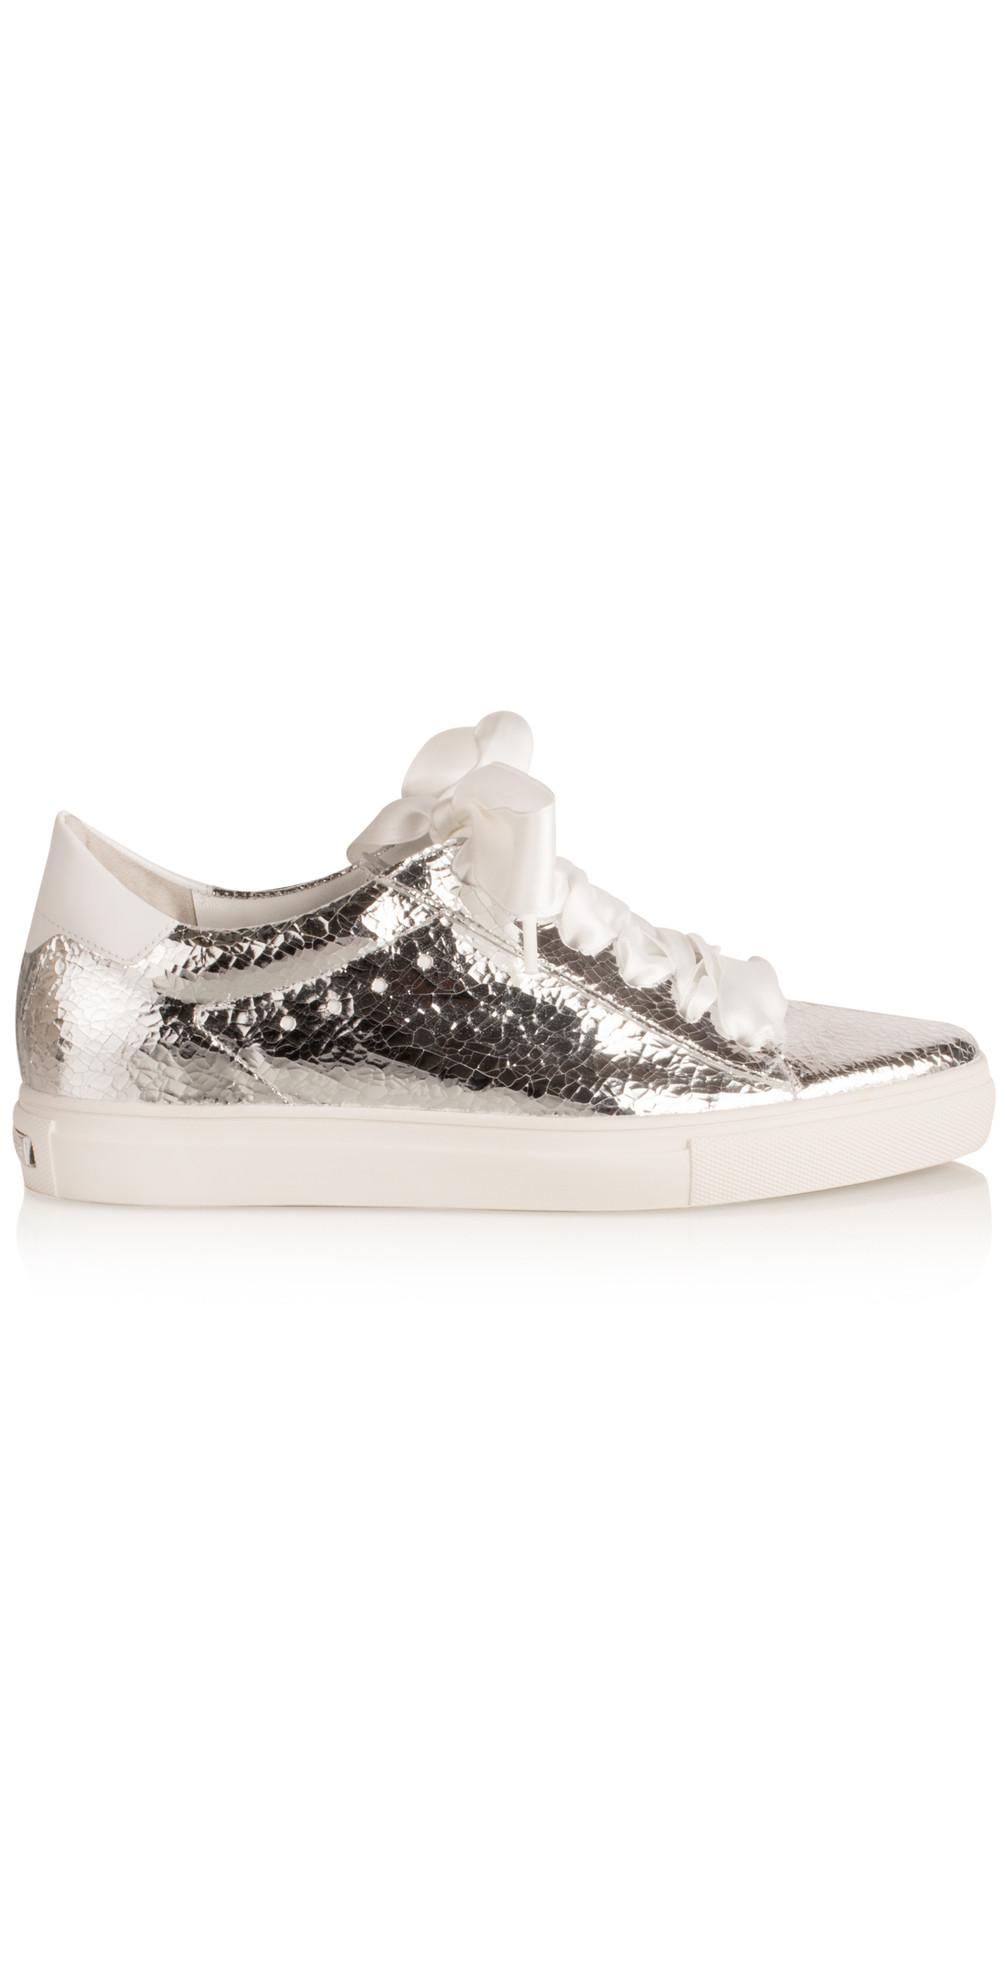 kennel und schmenger scoop flash trainer shoe in silver. Black Bedroom Furniture Sets. Home Design Ideas